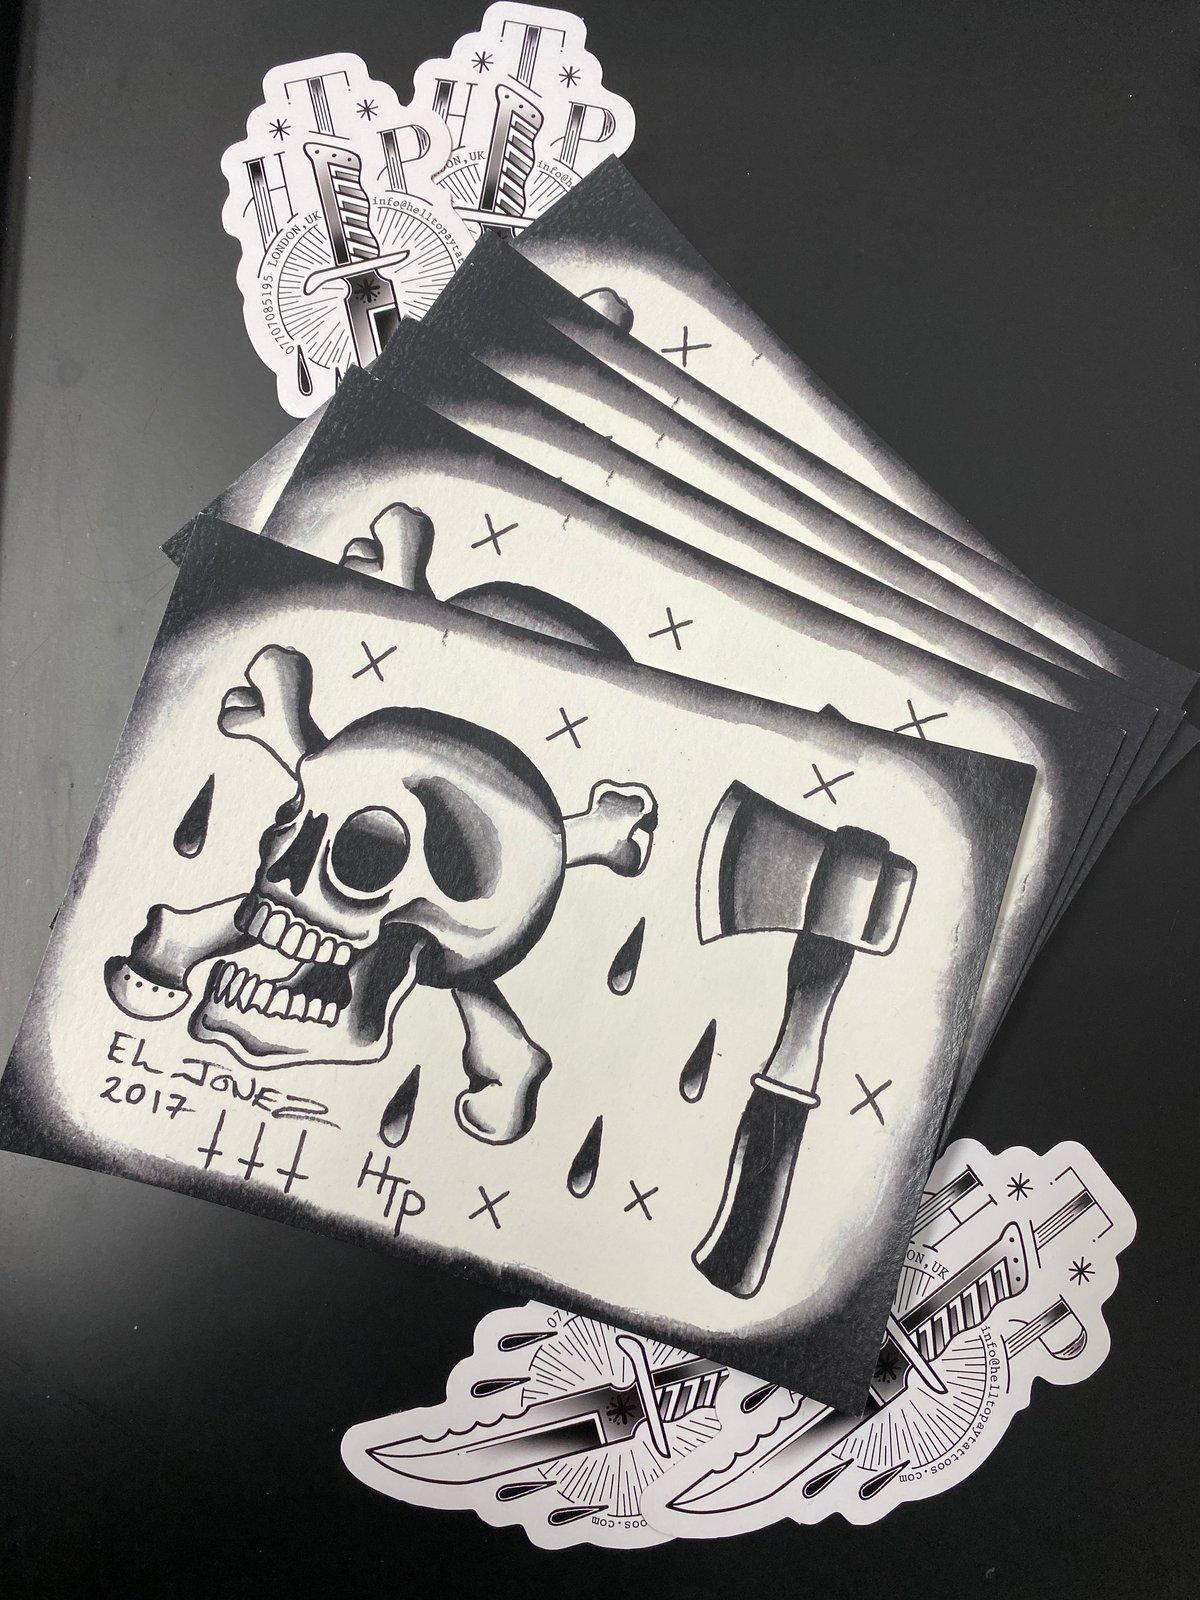 Image of EL JONEZ PRINT